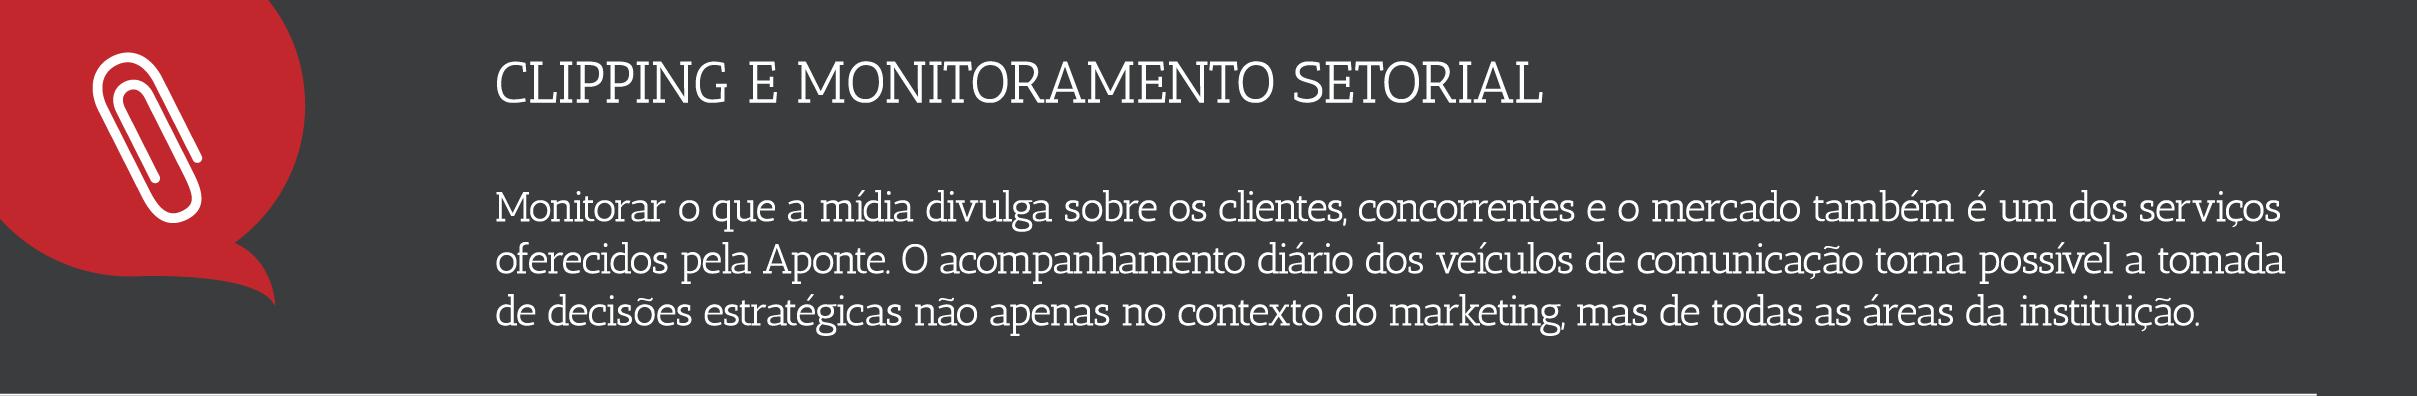 Servicos-clipping-03